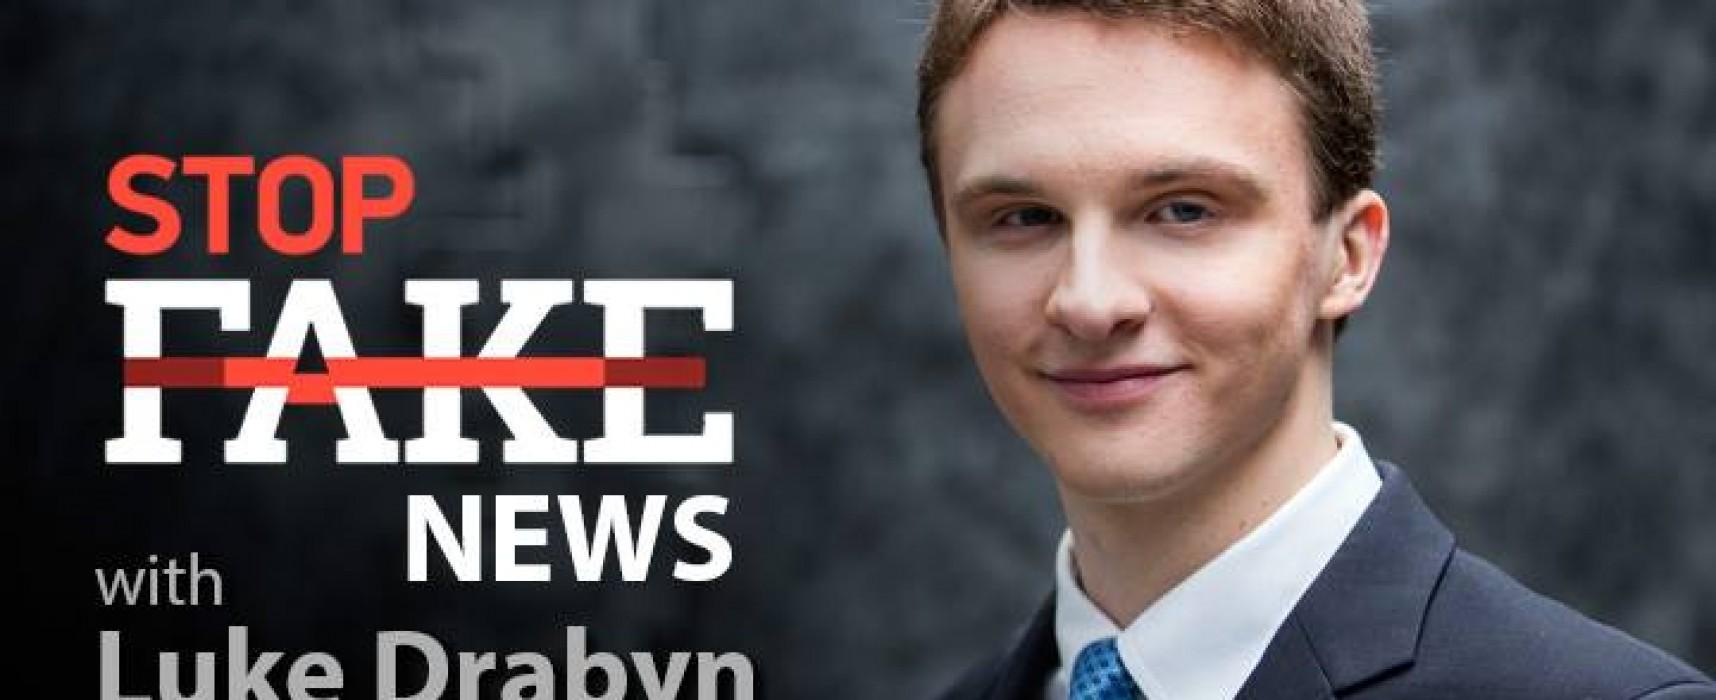 StopFakeNews #73 with Luke Drabyn